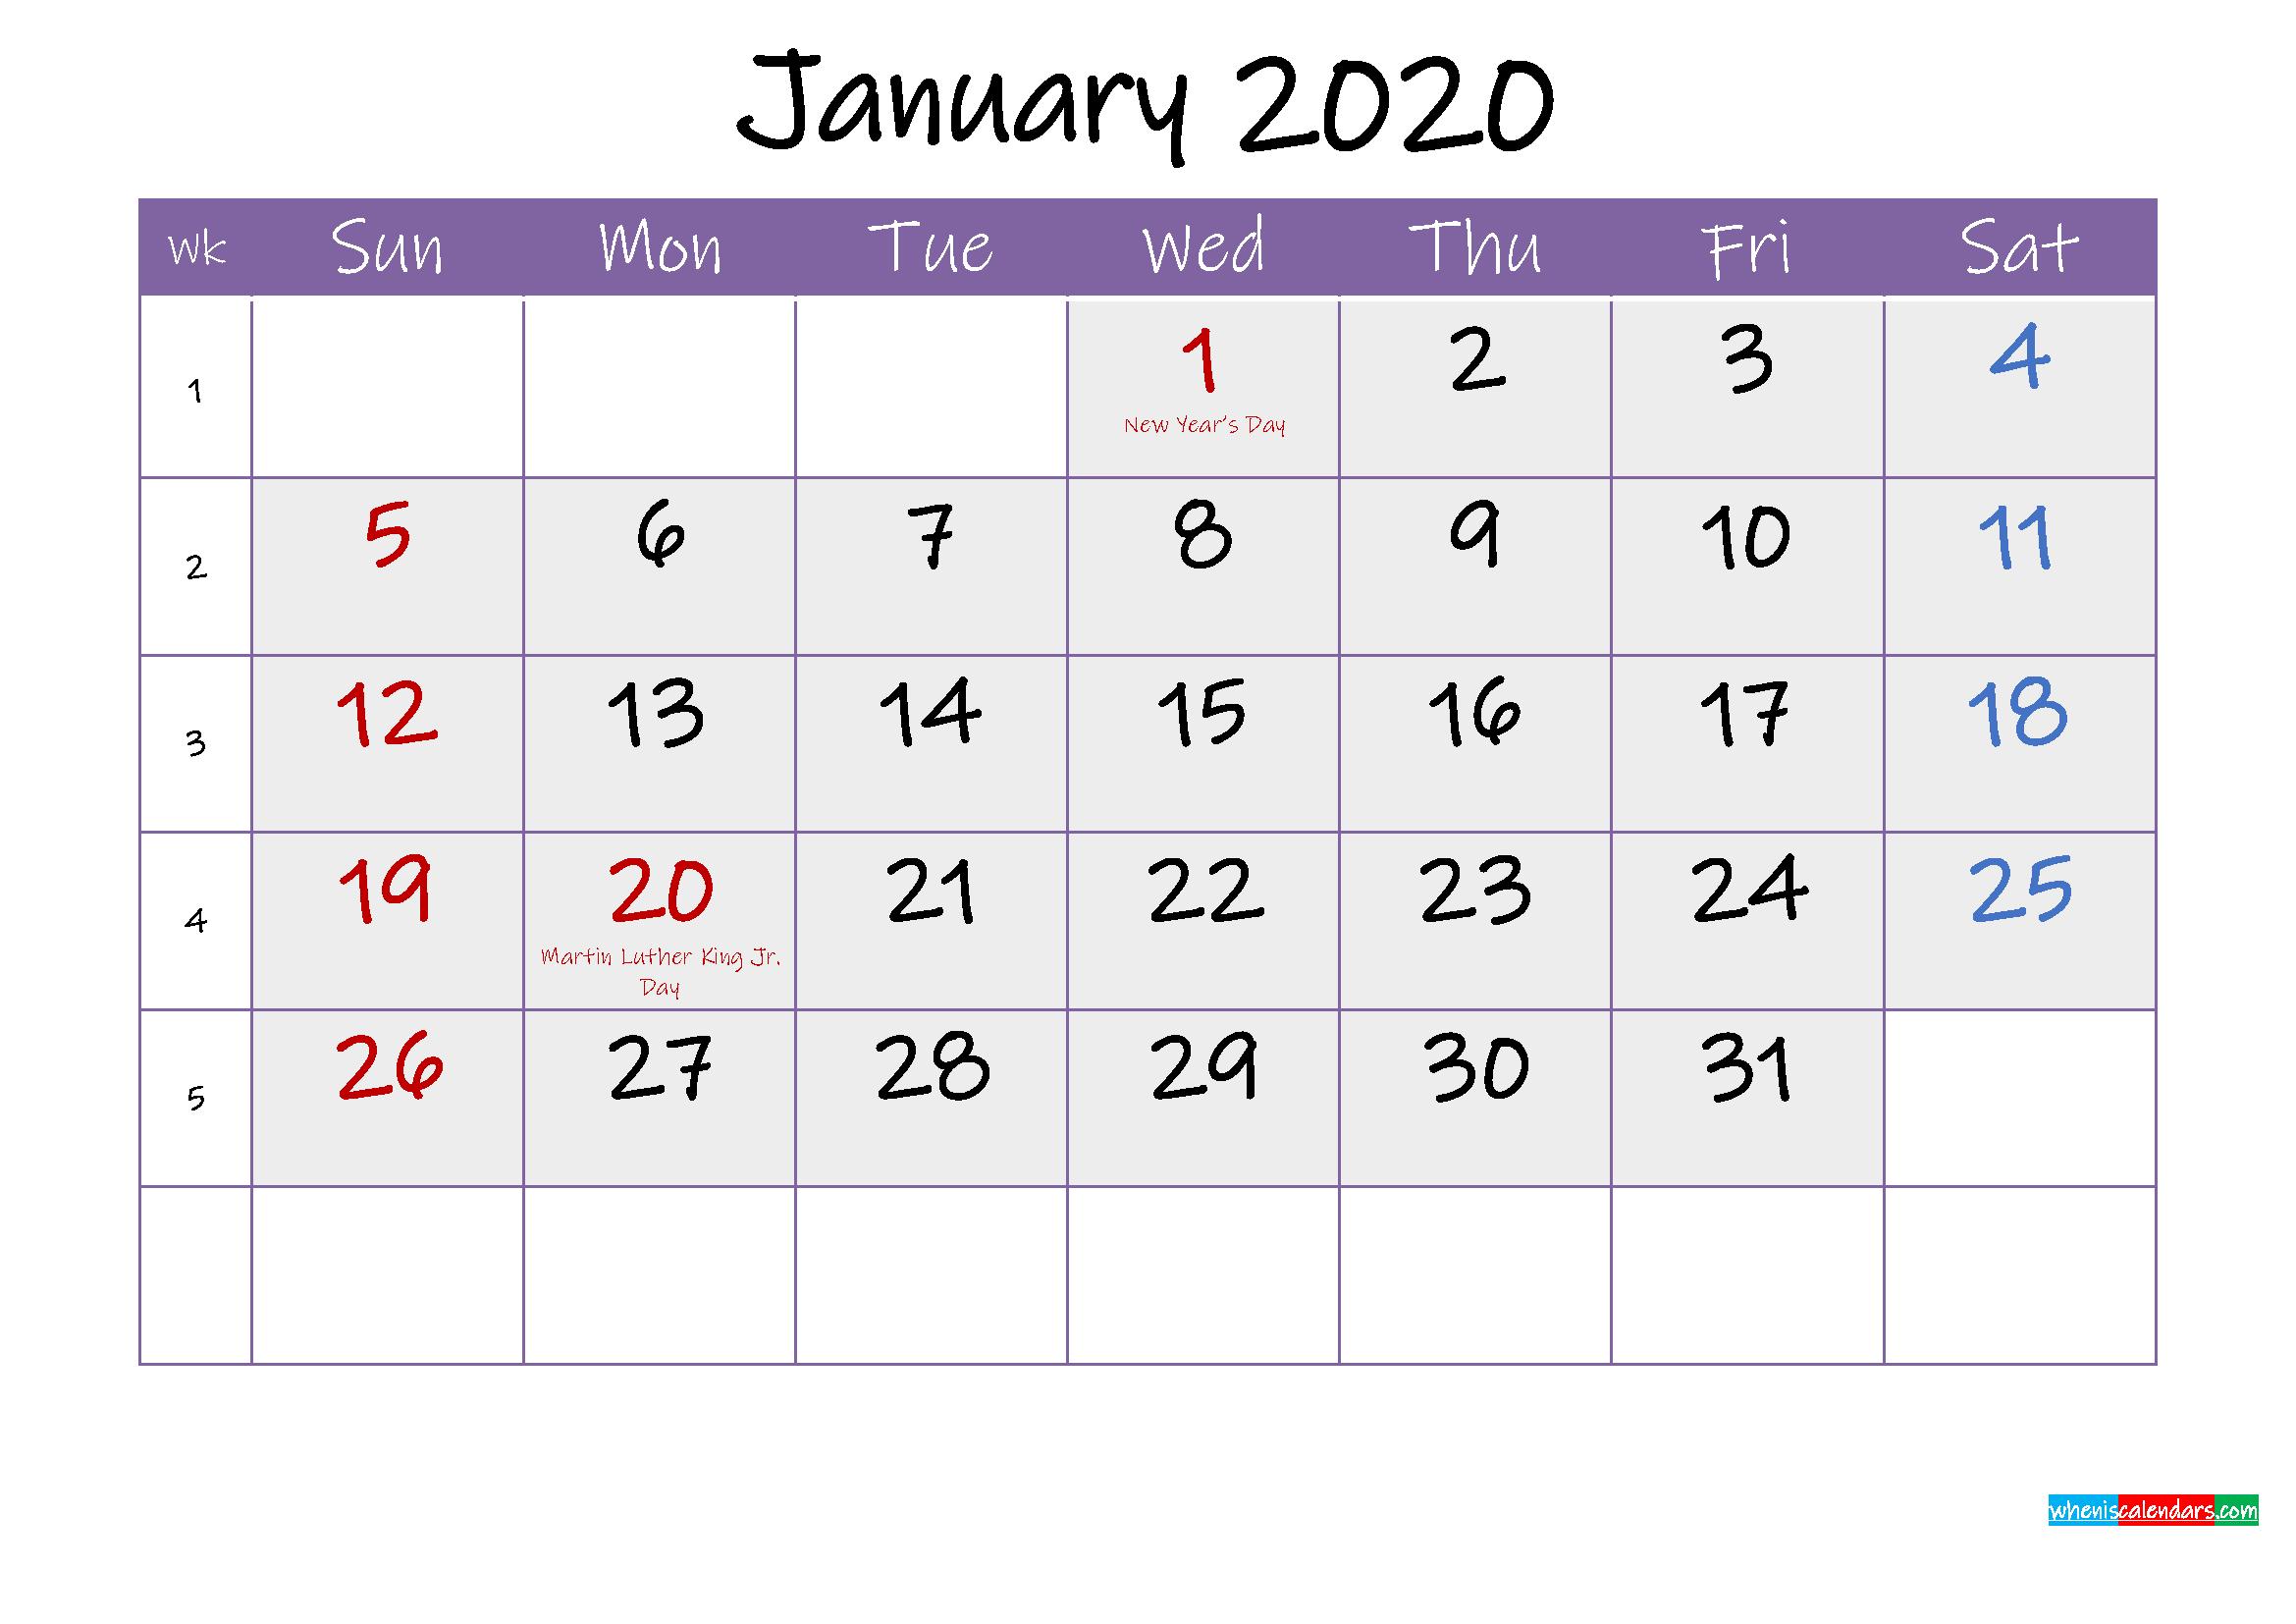 Free January 2020 Printable Calendar with Holidays